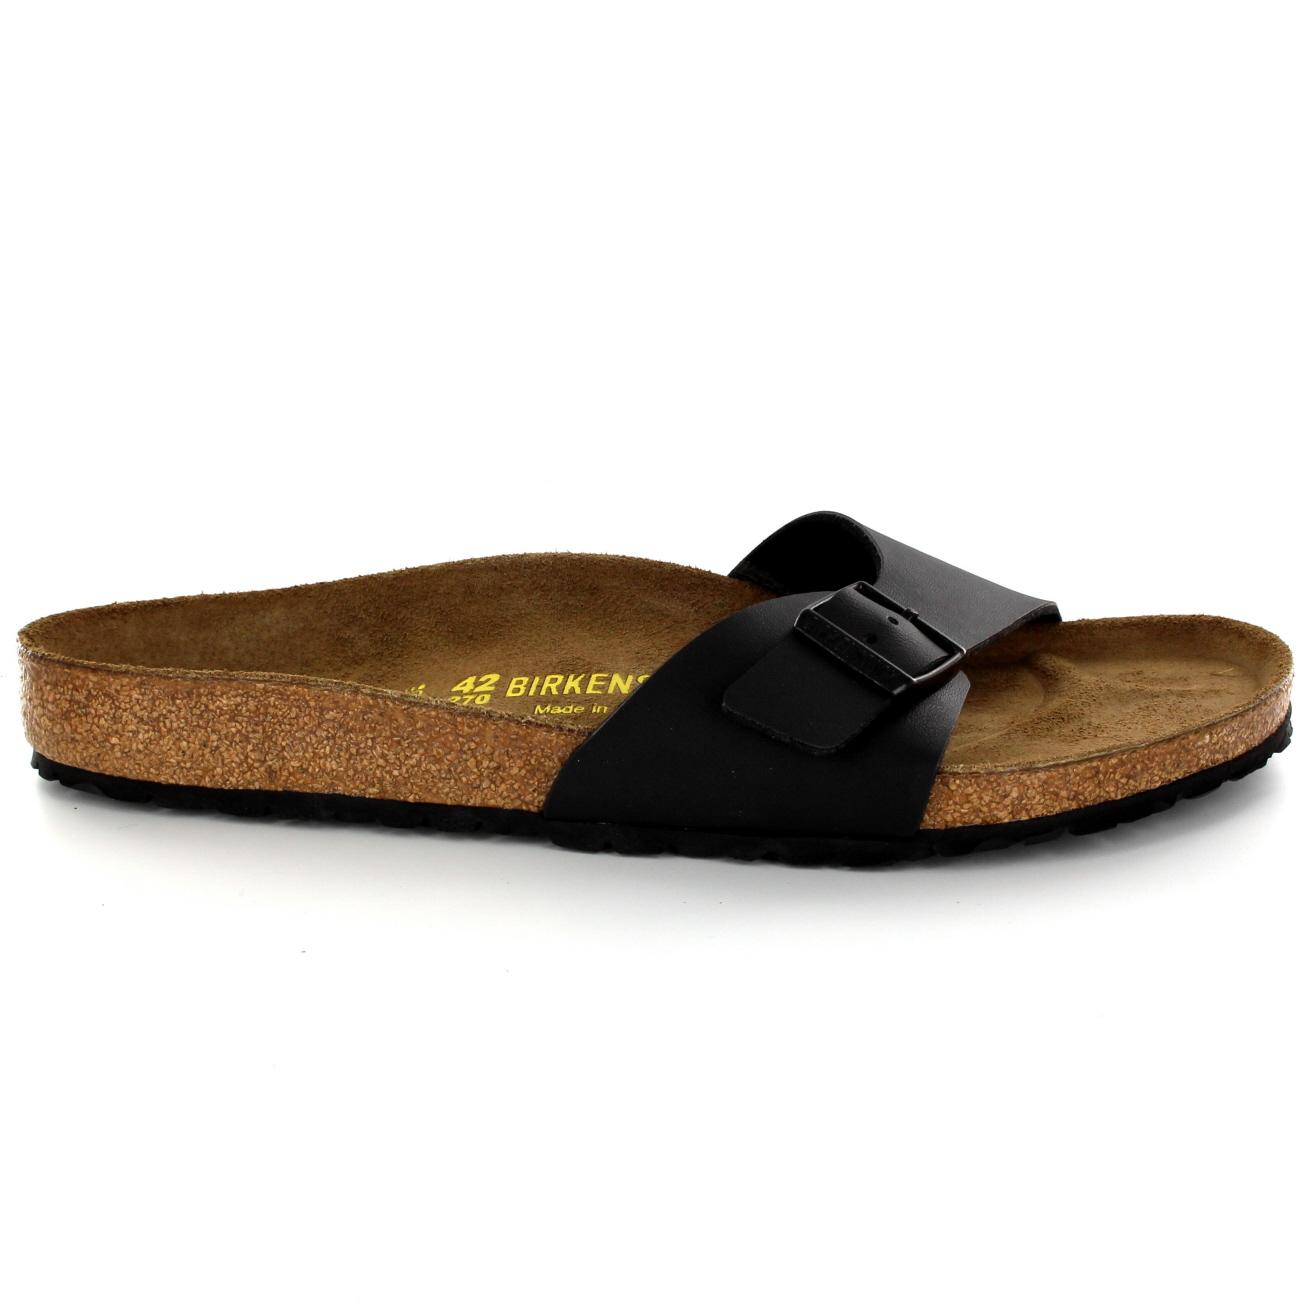 Unisex-Adults-Birkenstock-Madrid-Casual-Birko-Flor-Beach-Summer-Sandals-UK-2-13 thumbnail 13